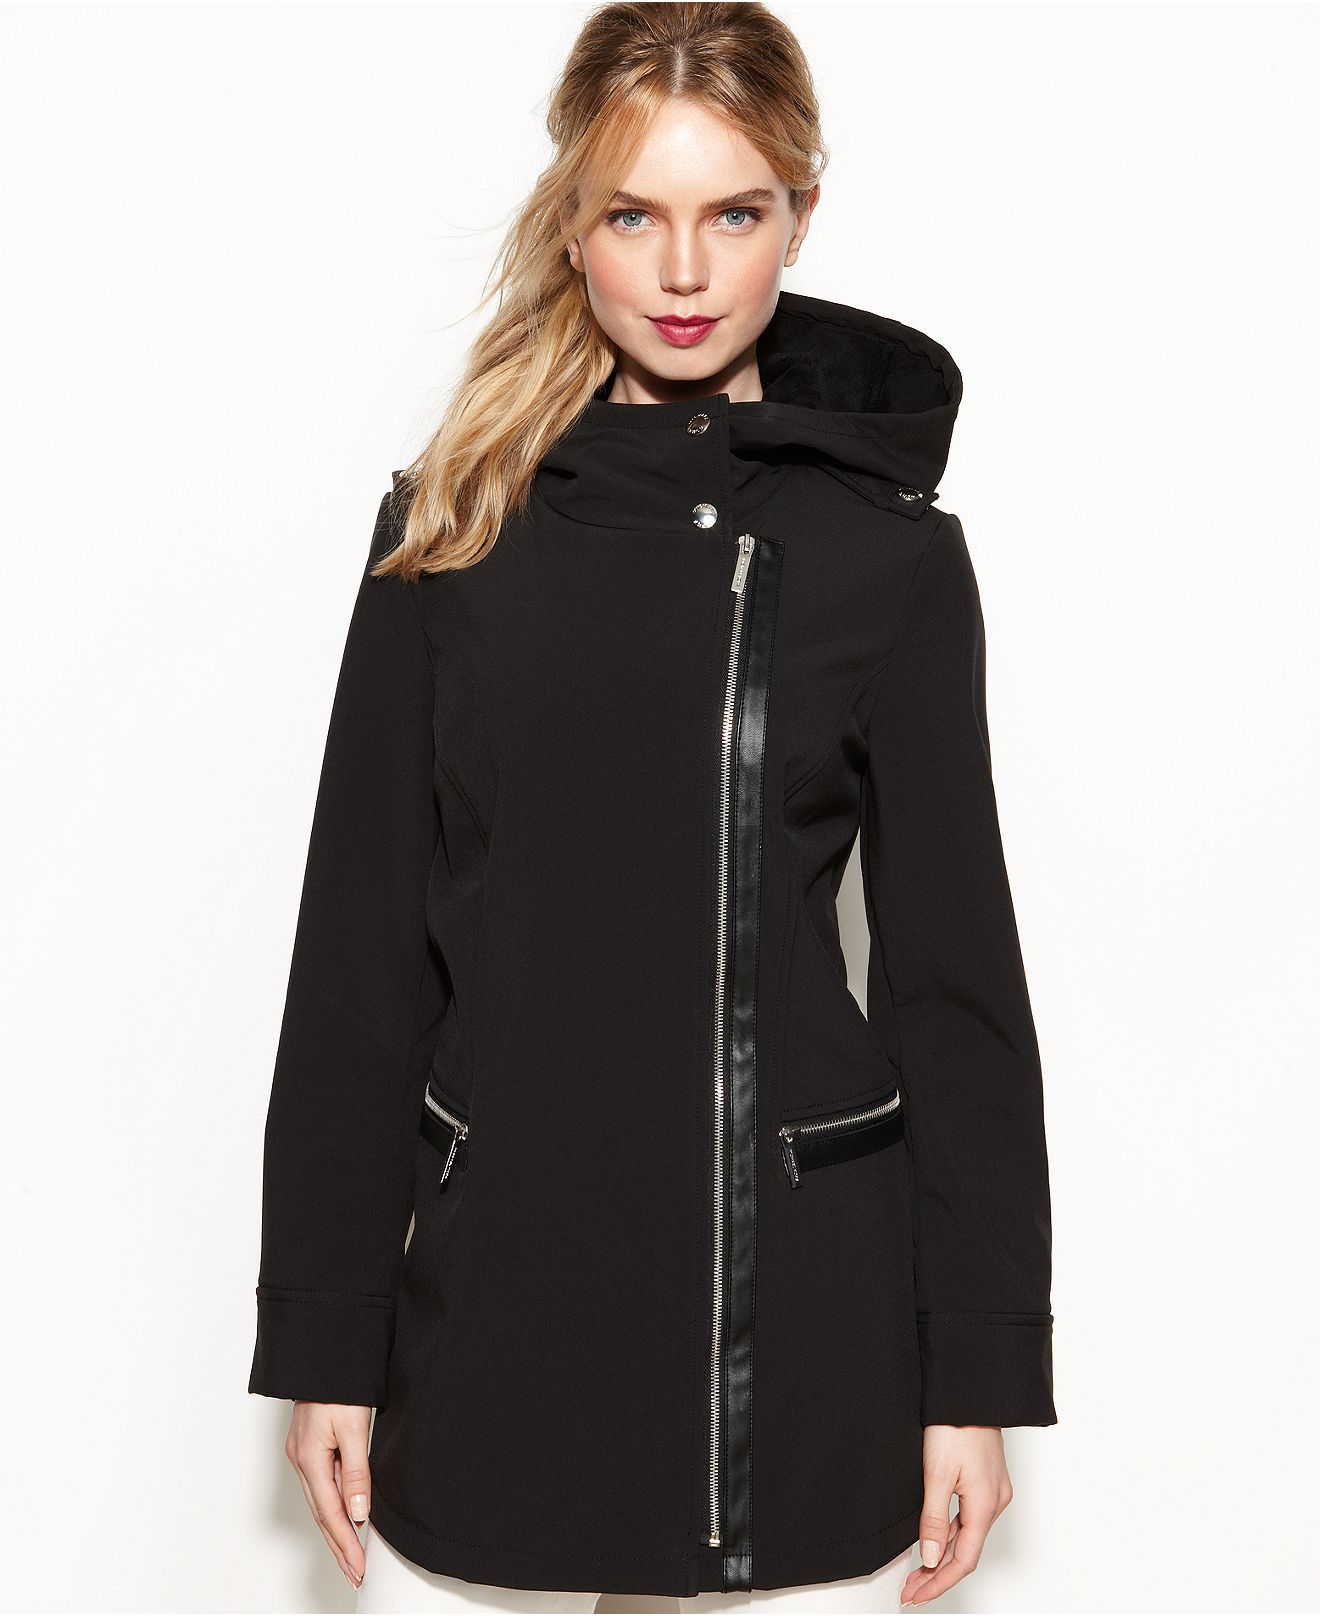 Michael Michael Kors Coat Hooded Faux Leather Trim Soft Shell Coats Women Macy S Hooded Faux Coats For Women Outerwear Women [ 1616 x 1320 Pixel ]